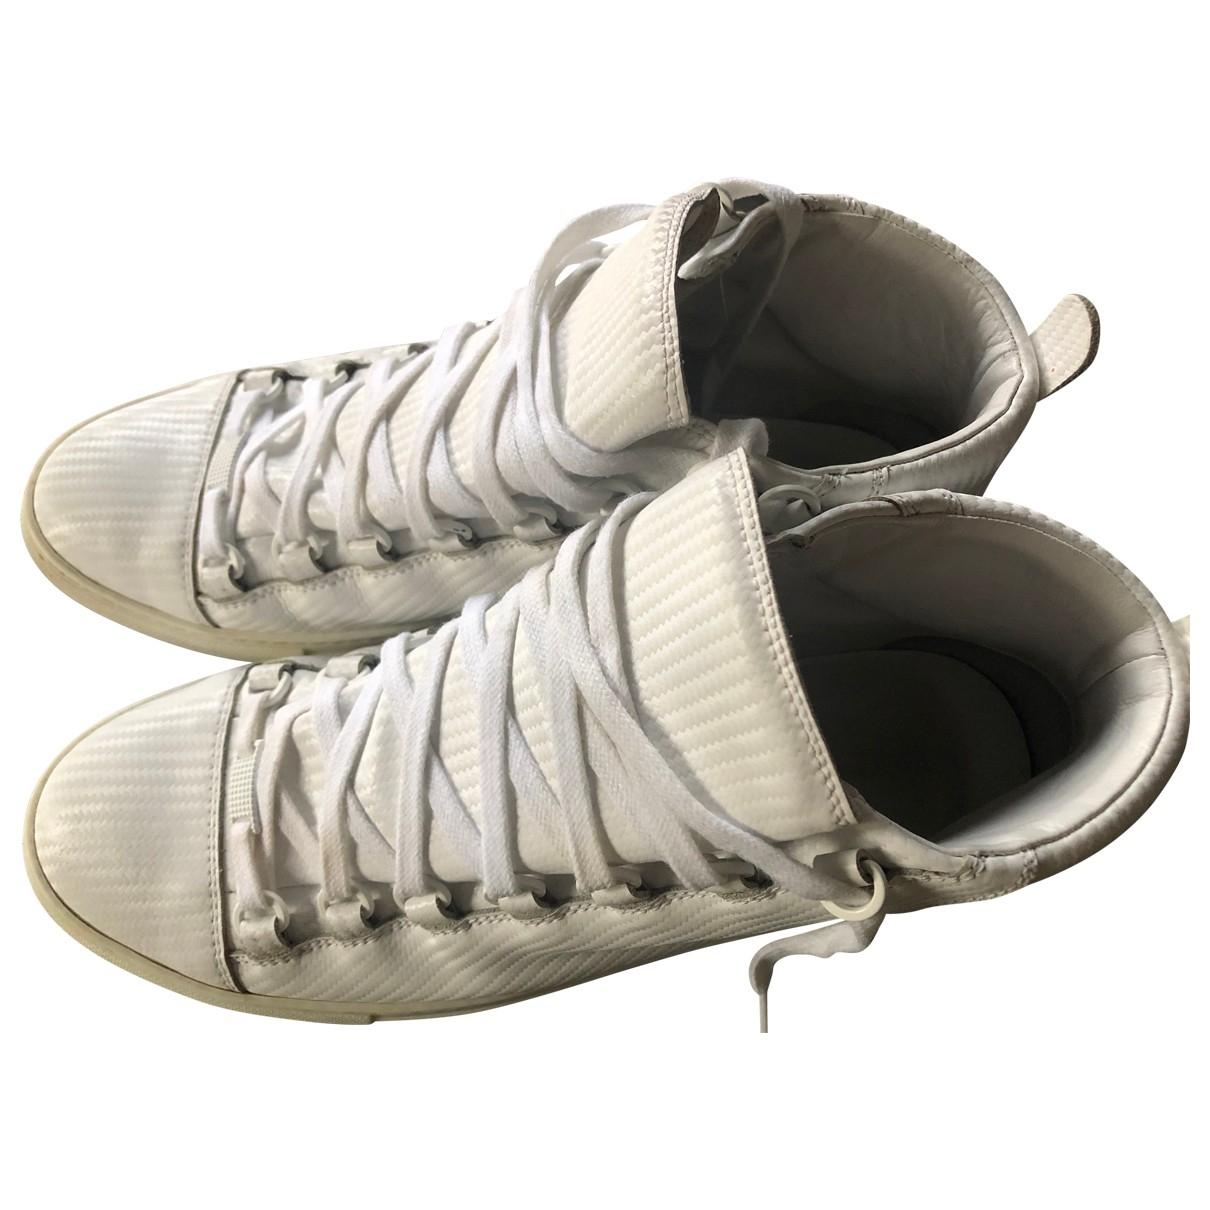 Balenciaga - Baskets   pour homme en cuir - blanc